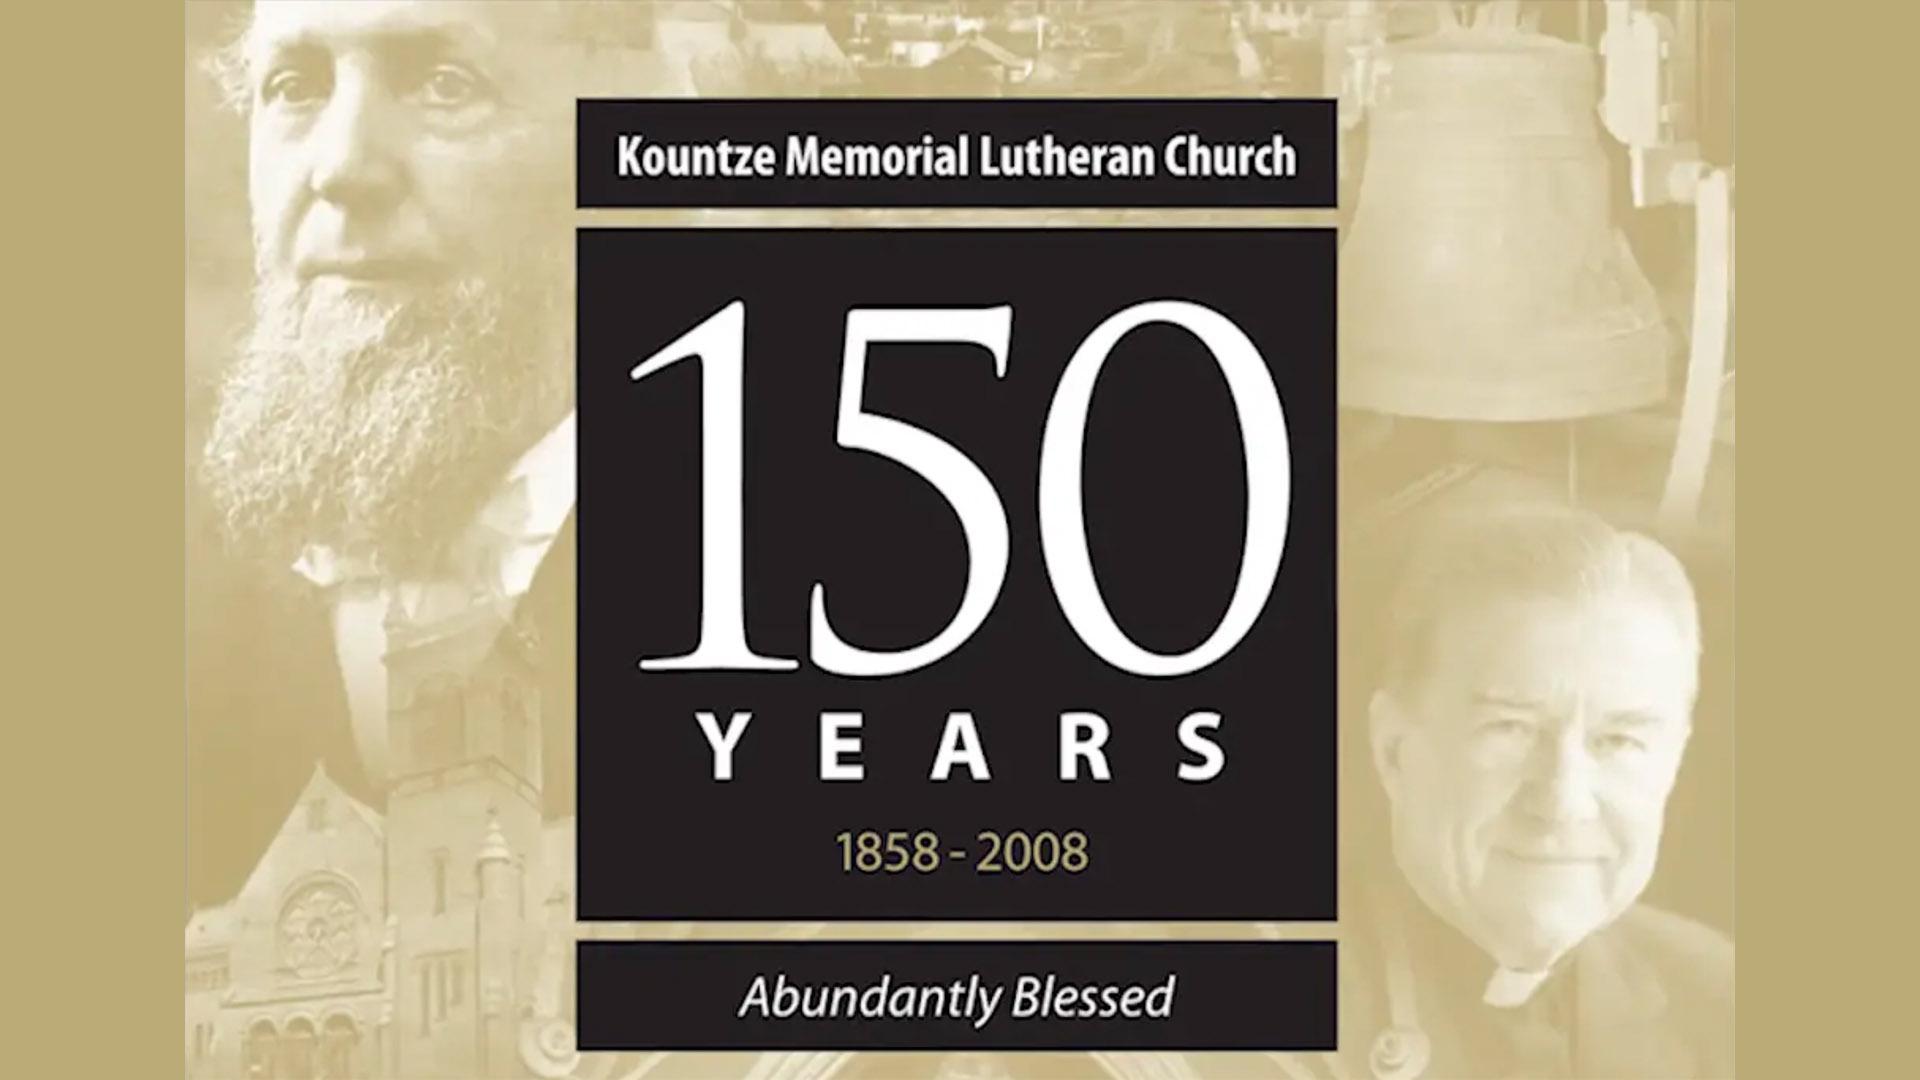 Kountze Memorial Lutheran Church. LP Photo Video. Omaha Video Production.